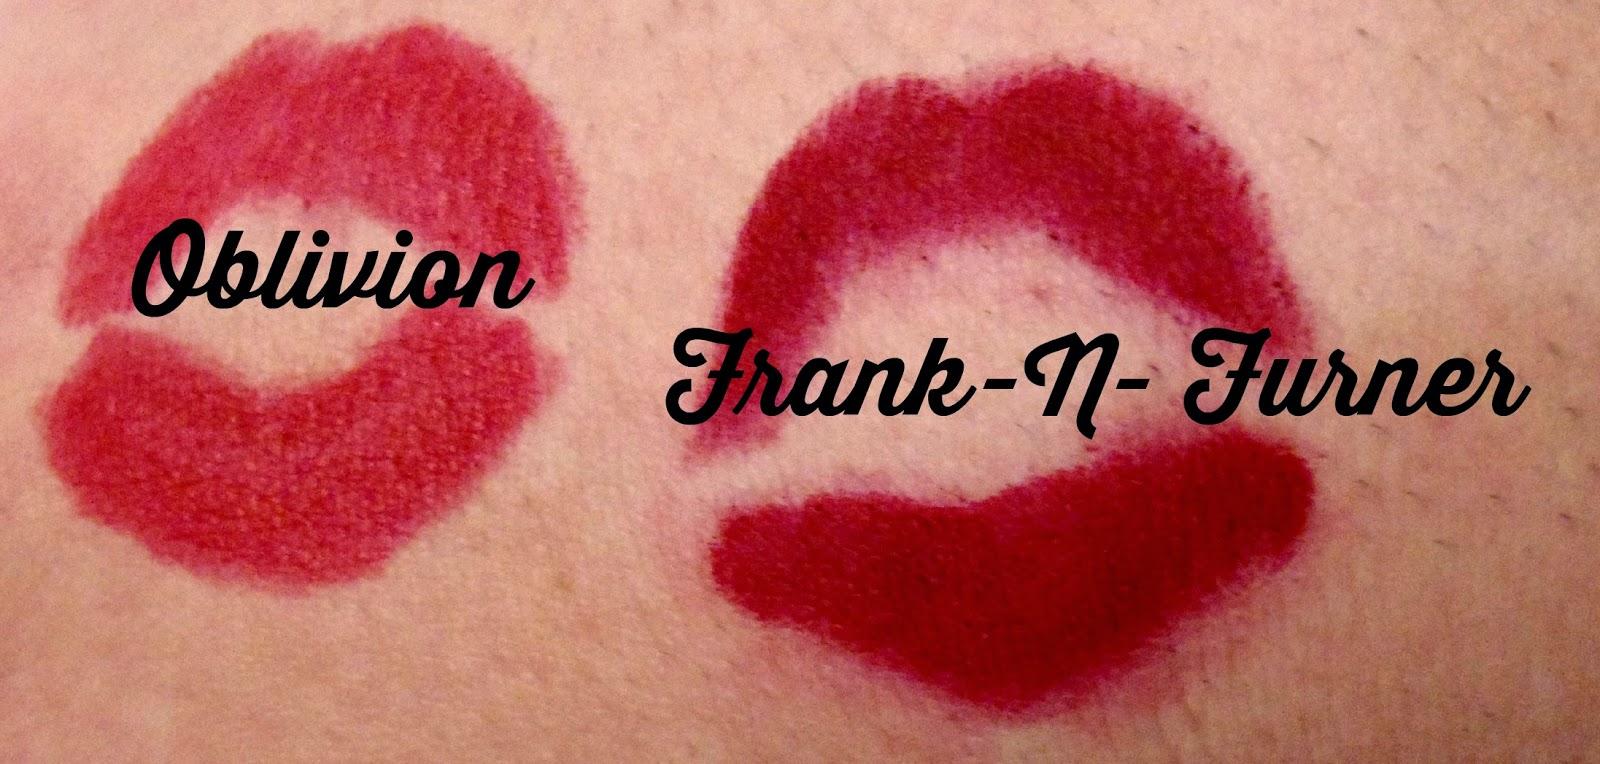 Rocky Horror Lipstick  Oblivion Frank-n- Furtner